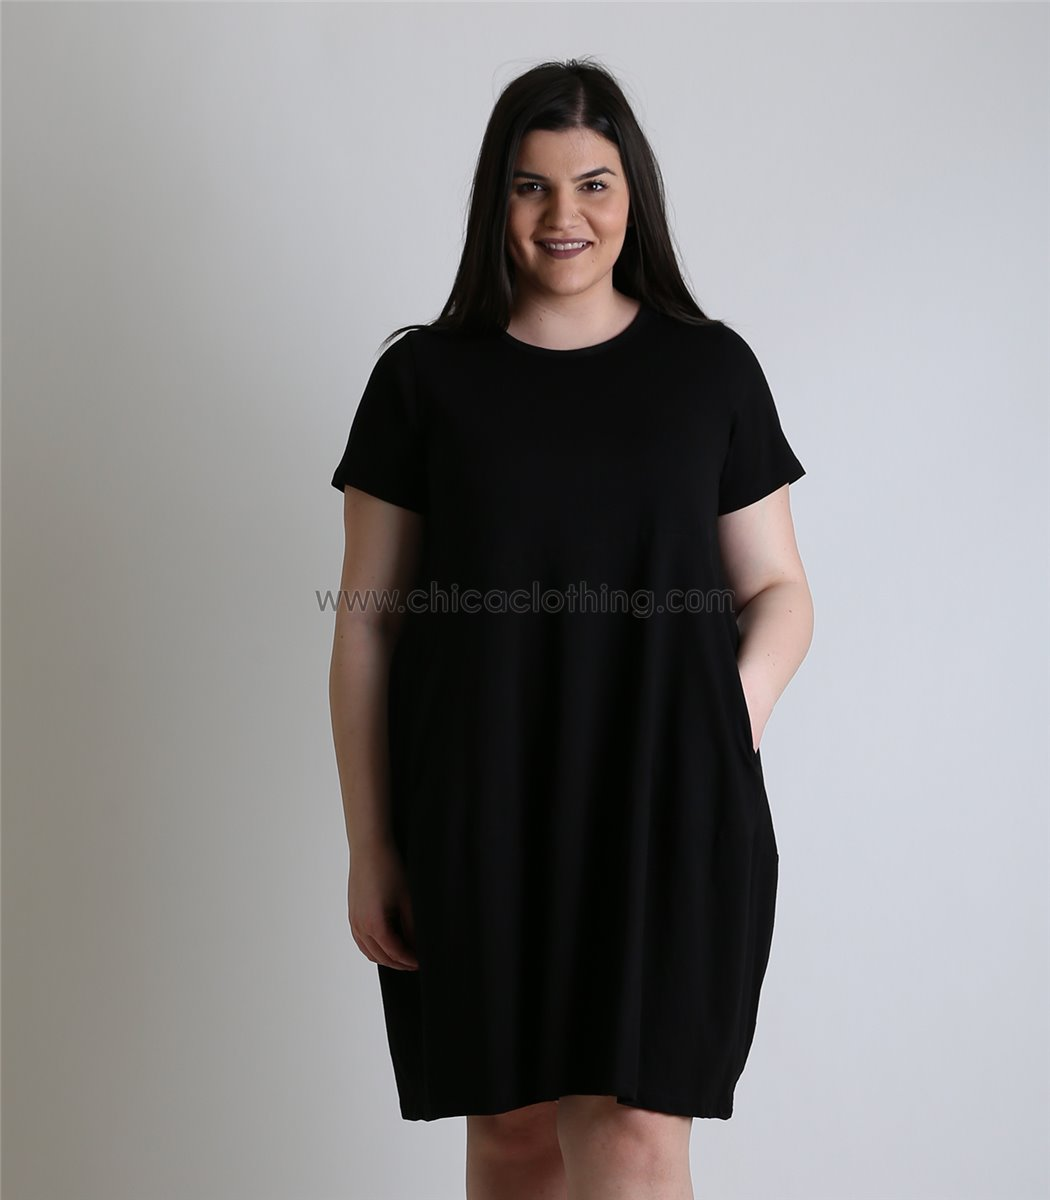 85256d382f90 Γυναικείο φόρεμα viscose φαρδύ με τσέπες (Μαύρο)